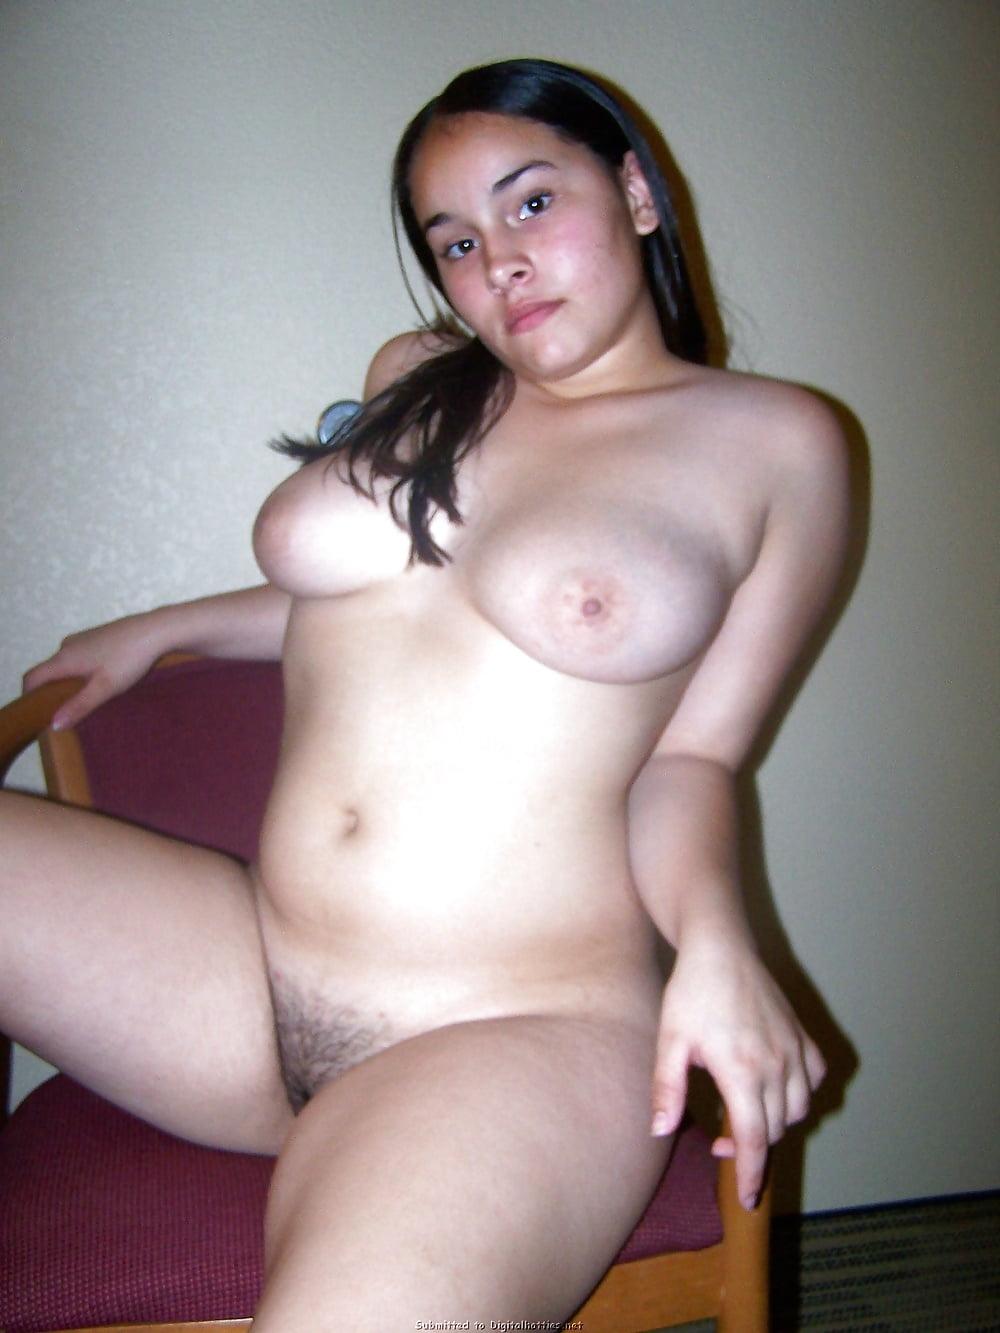 Latina girls pics and chubby women galleries